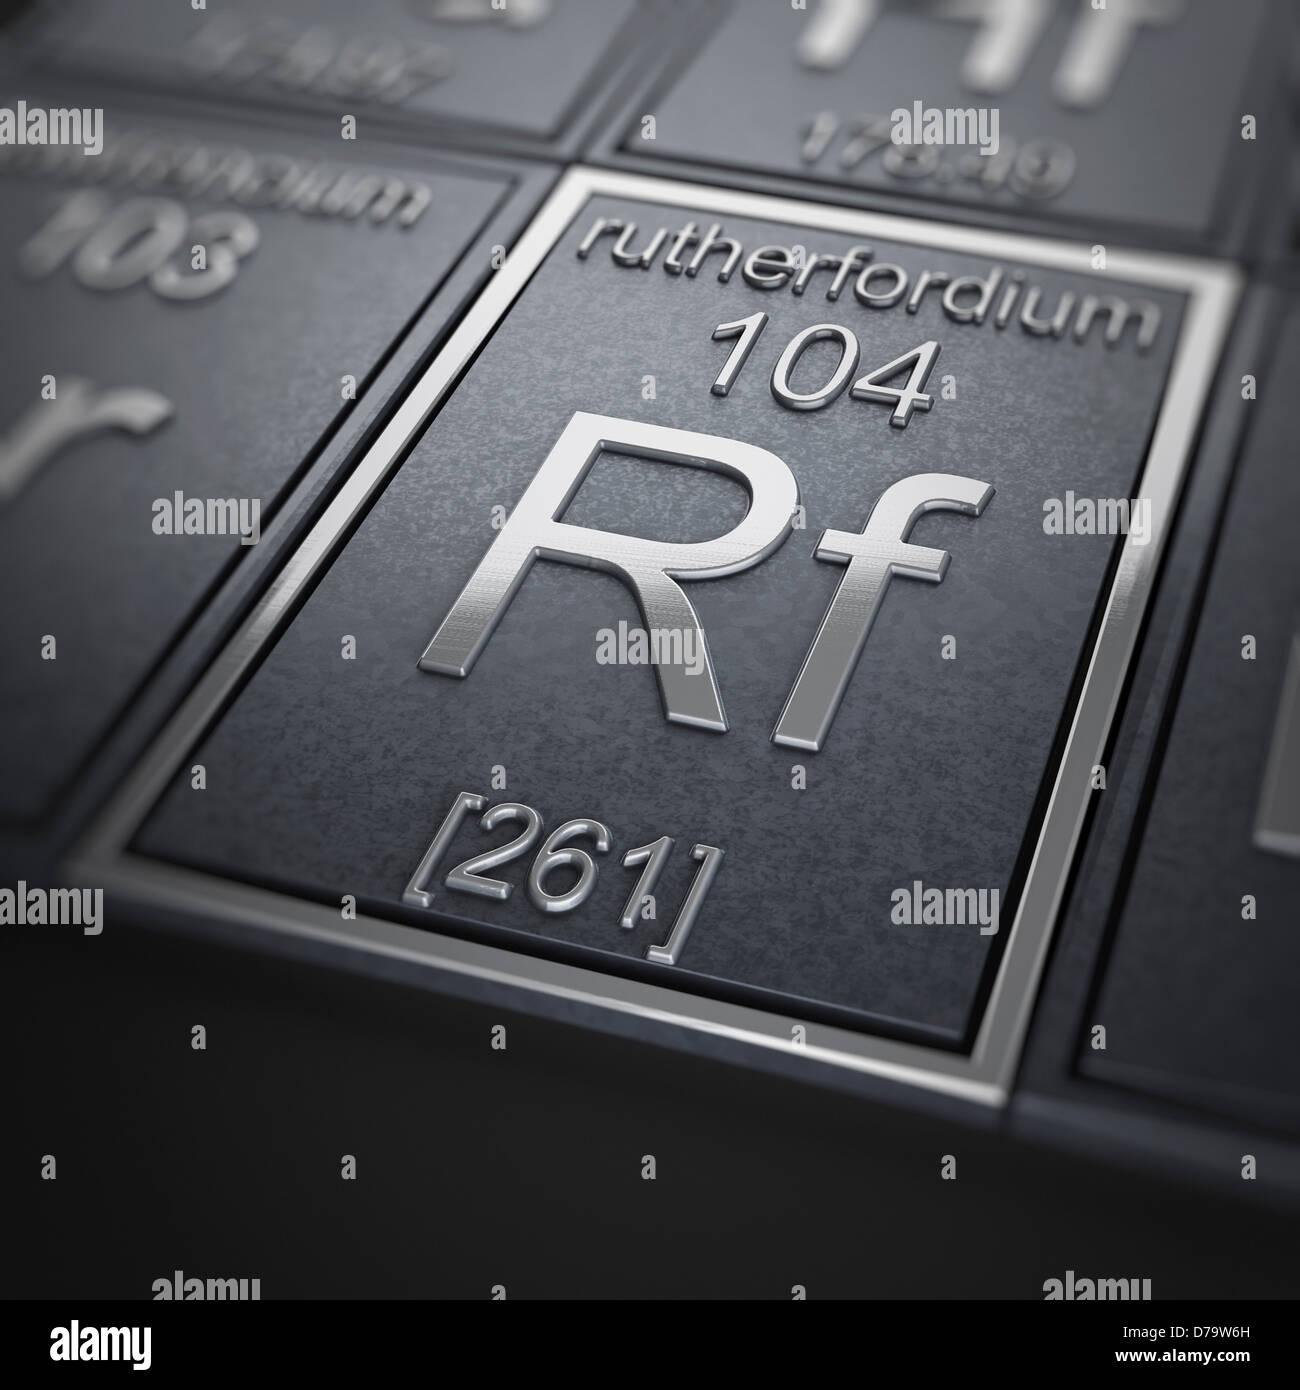 Rutherfordium Chemical Element) Stock Photo